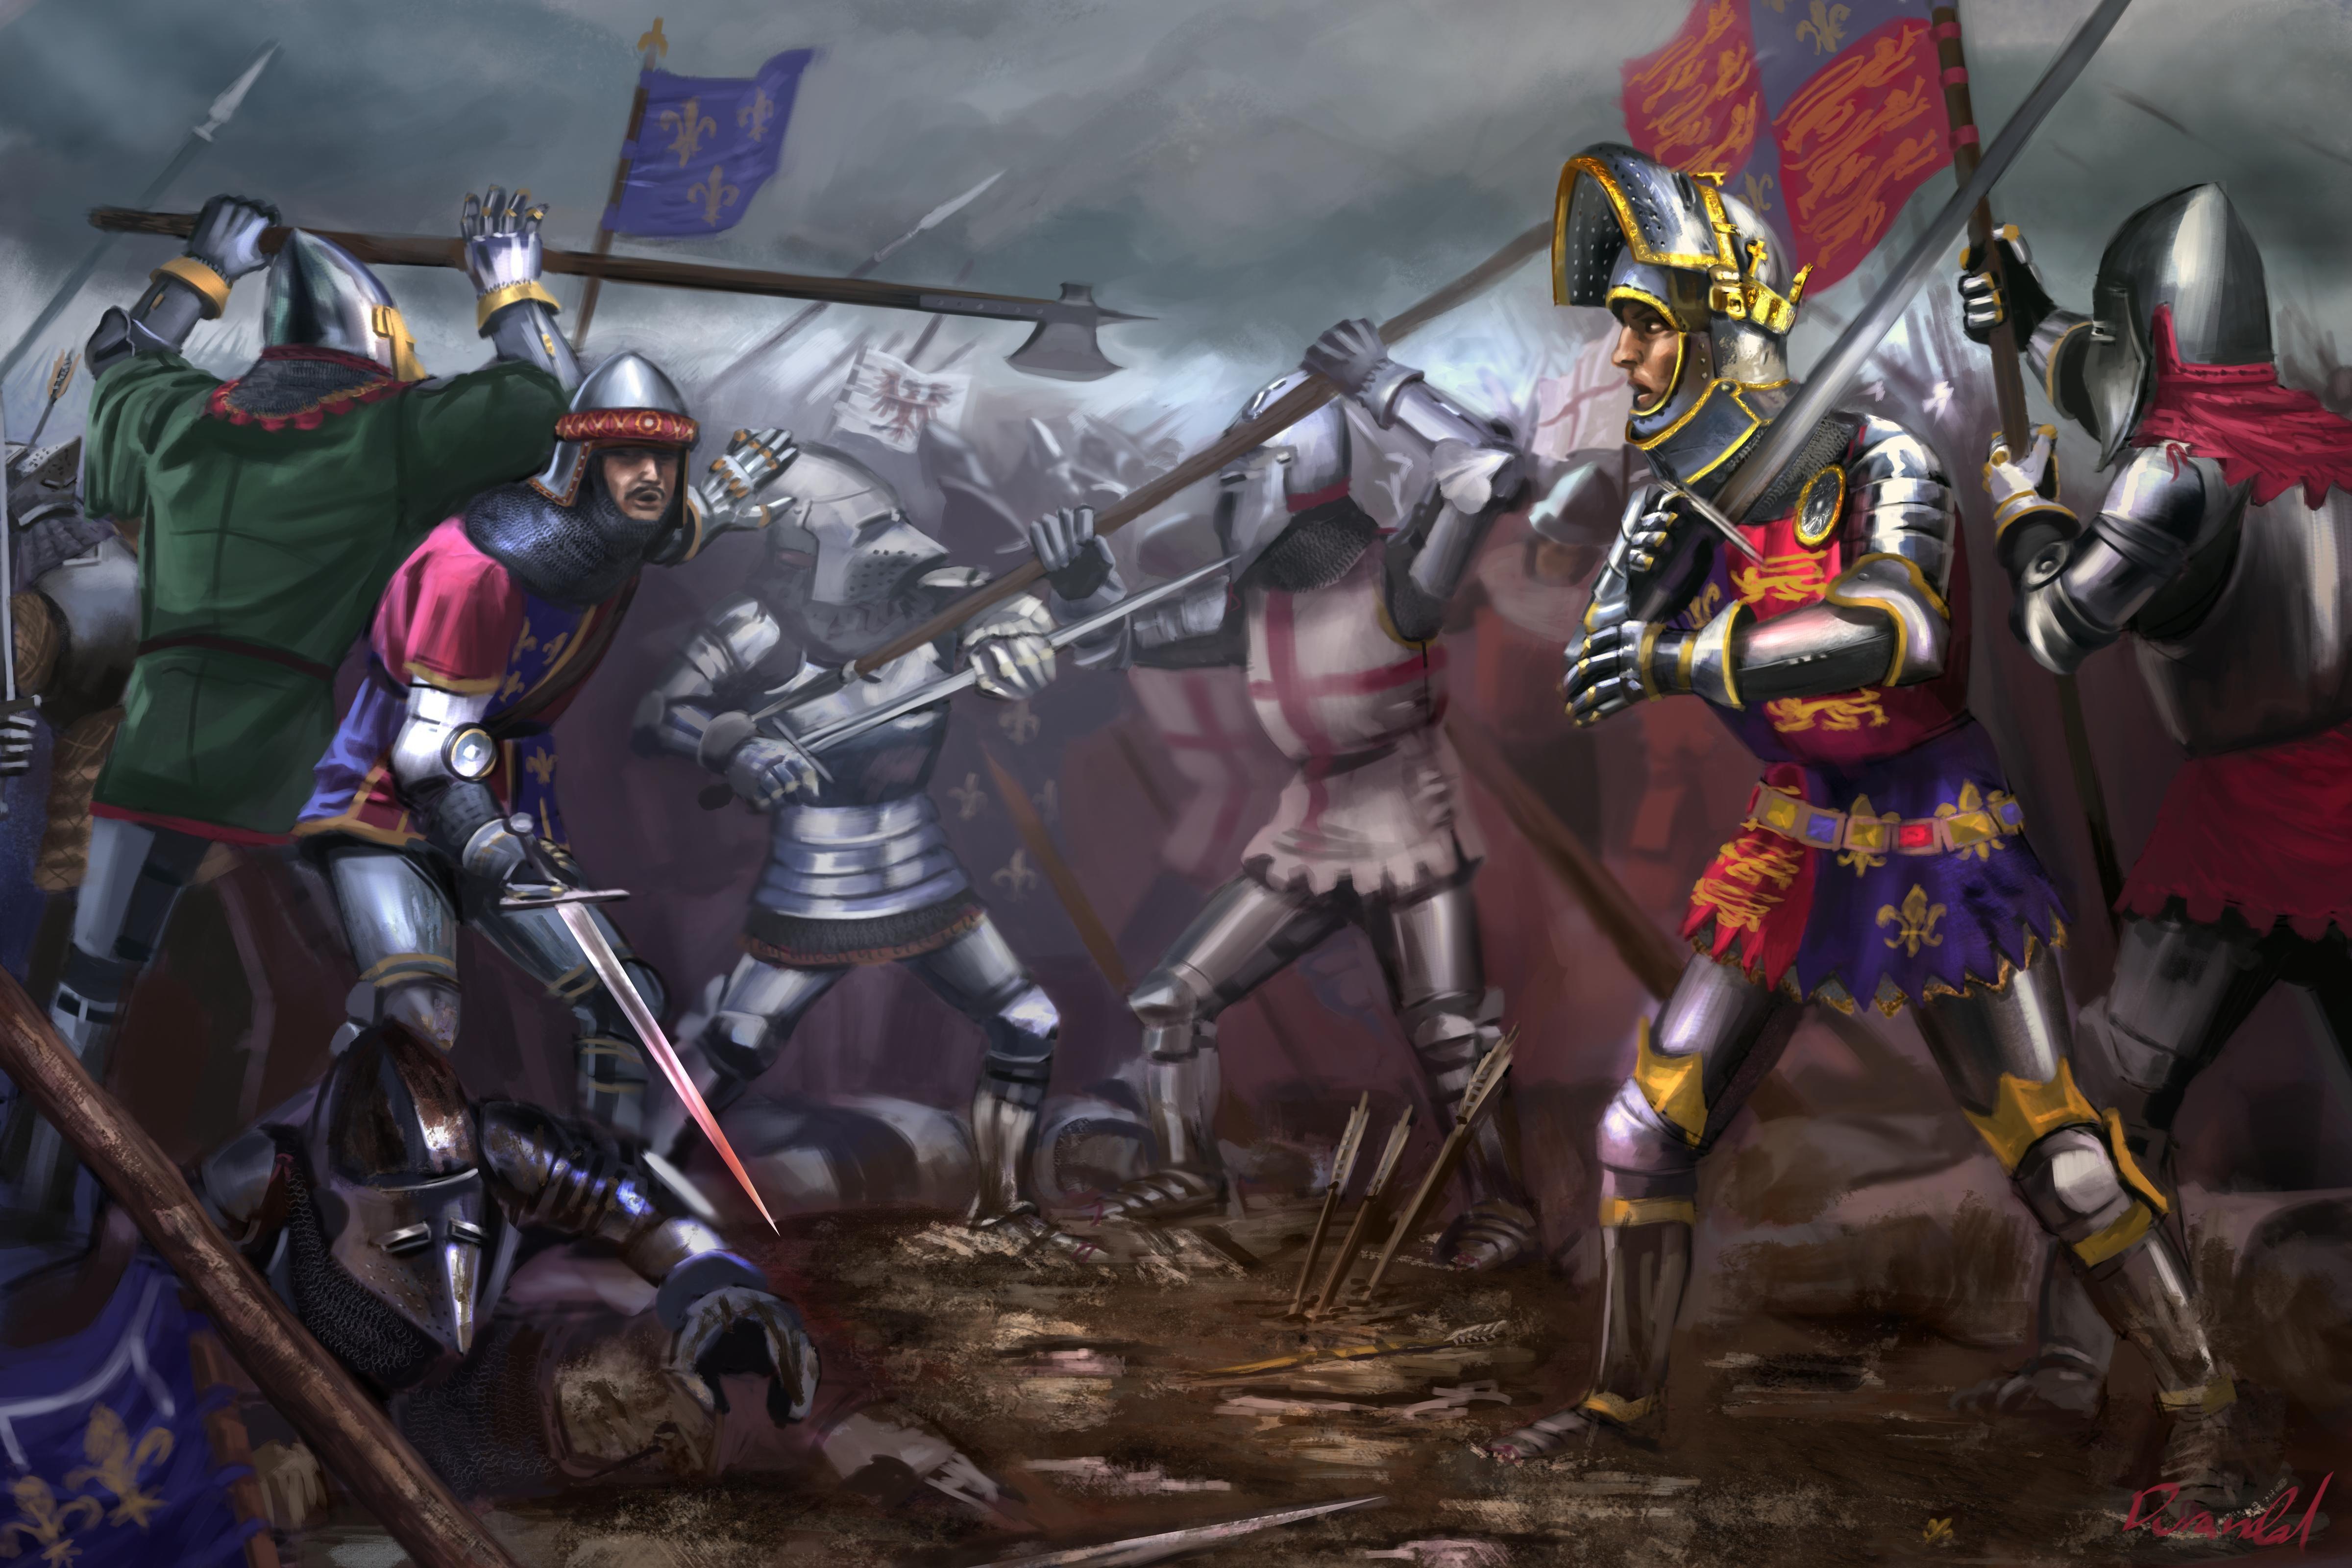 The Battle of Agincourt, Hundred Years War | Hundred Years War Art ...